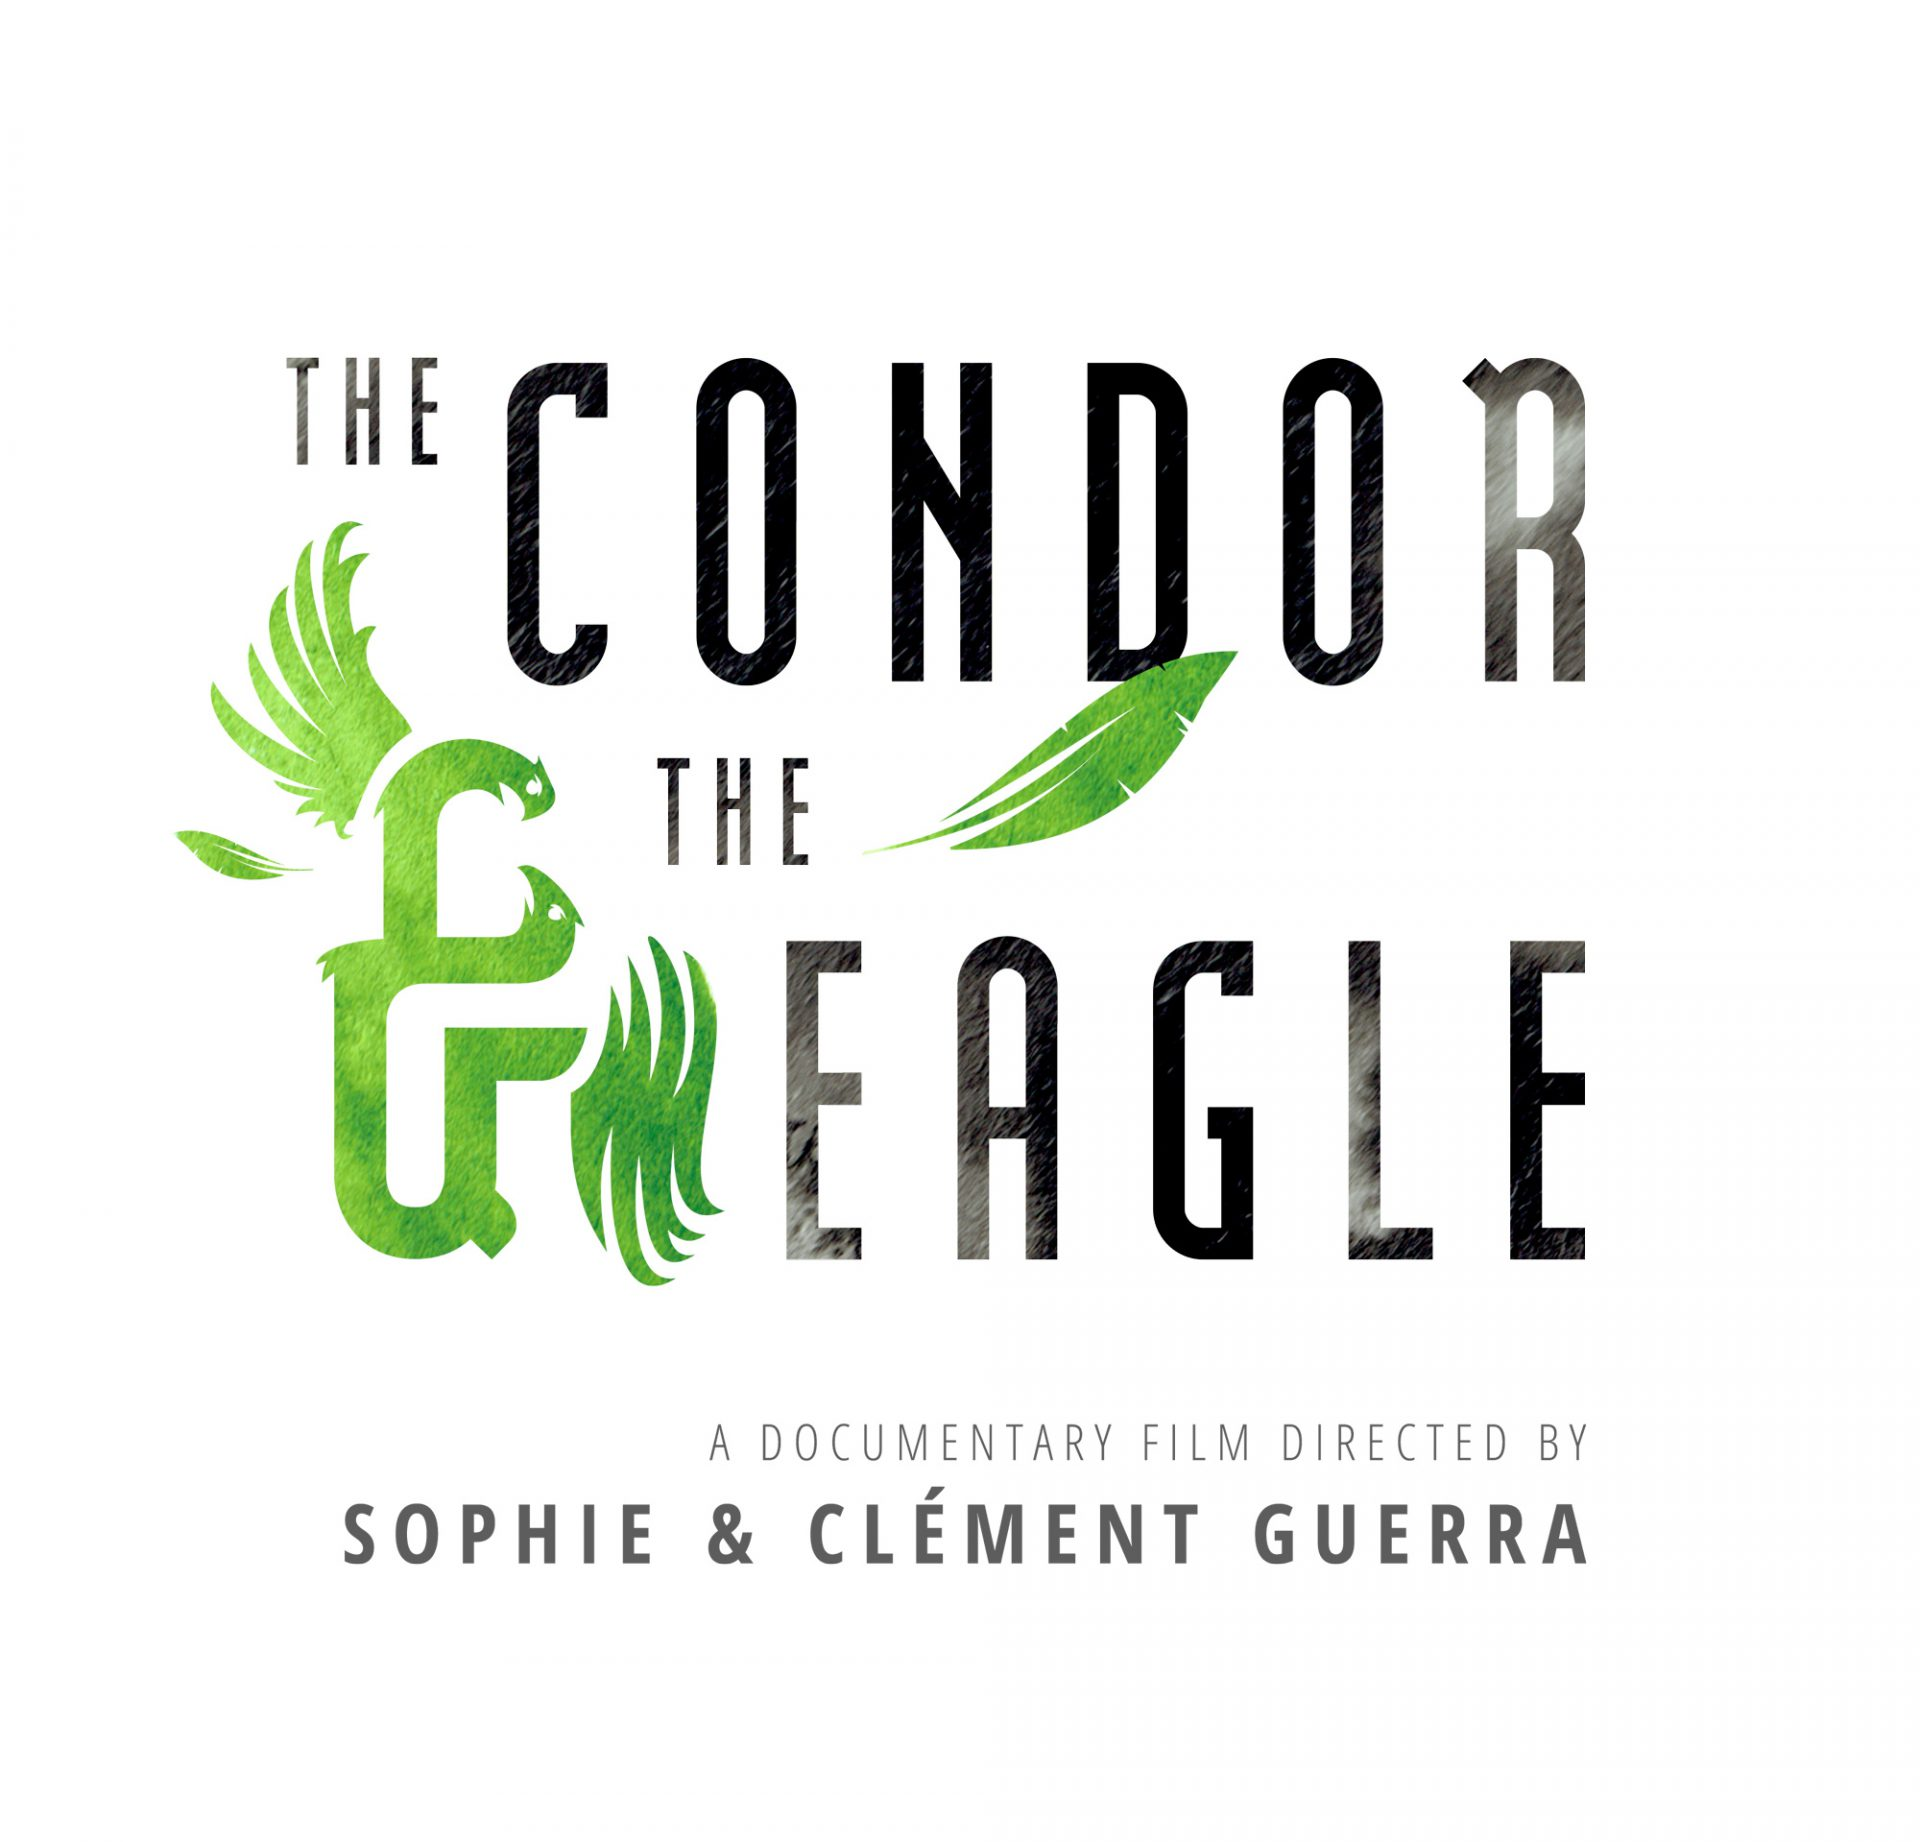 Logo the Condor and the eagle